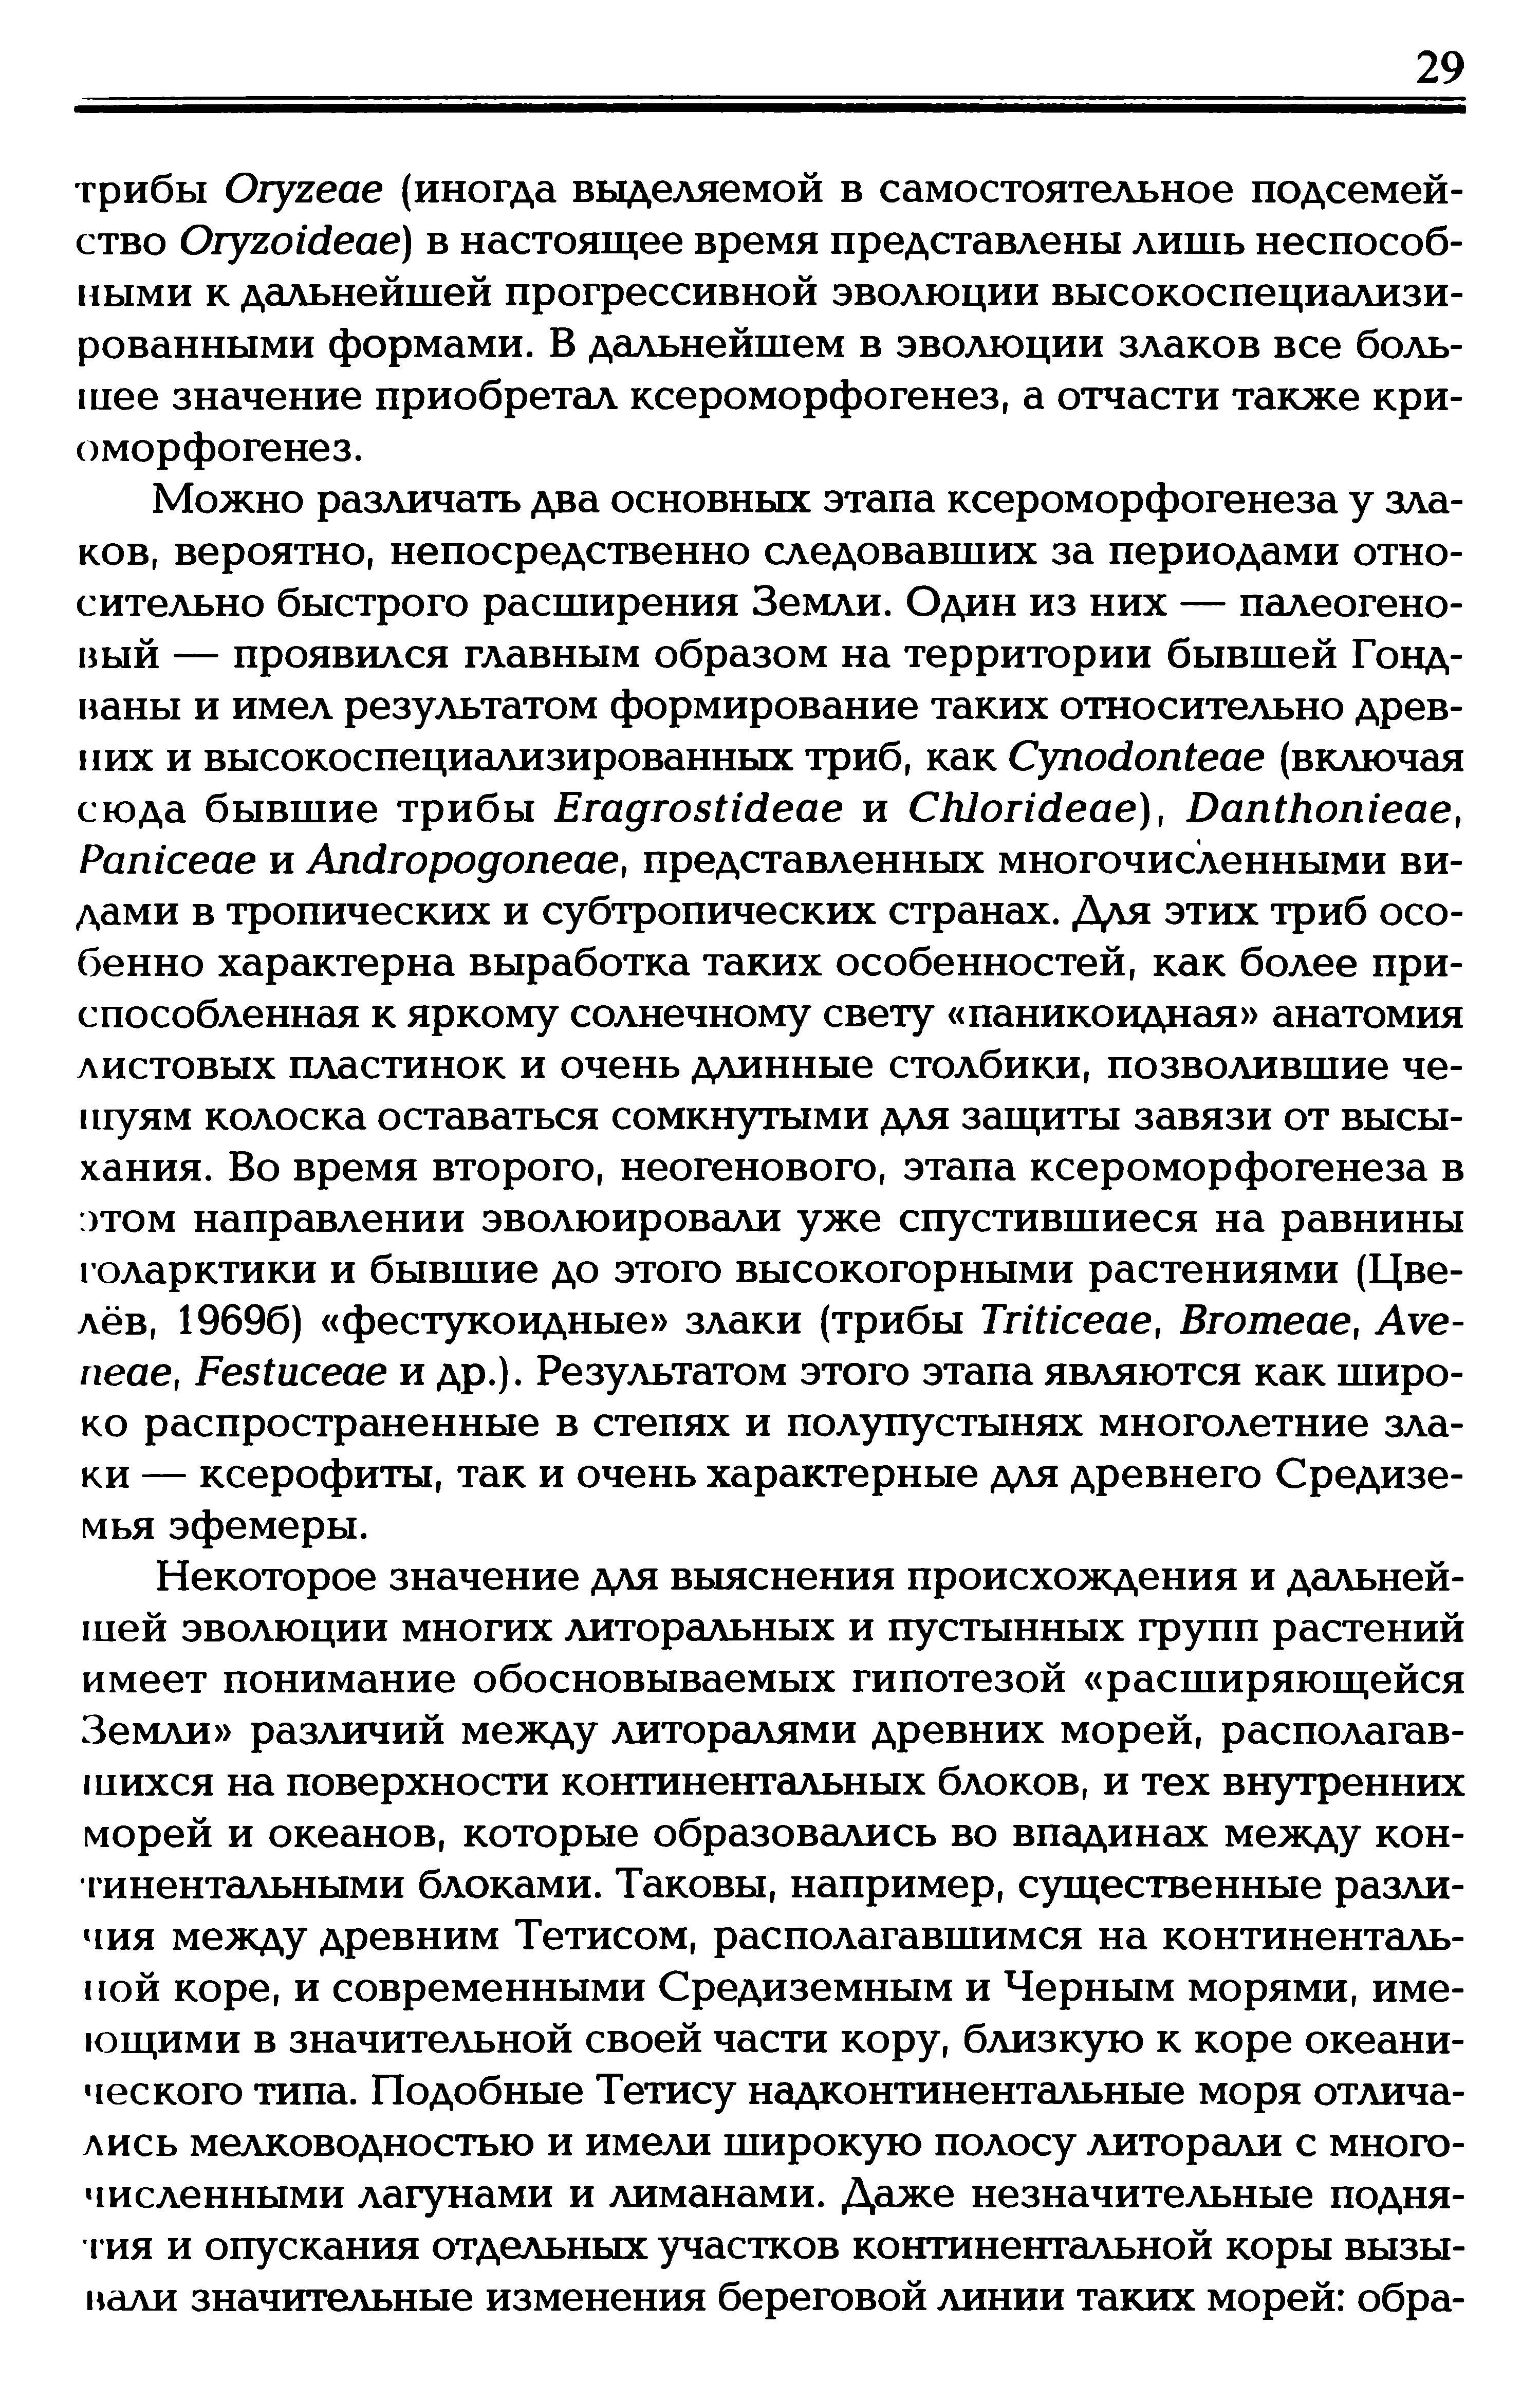 Tzvelev, 2005_1_10.jpeg